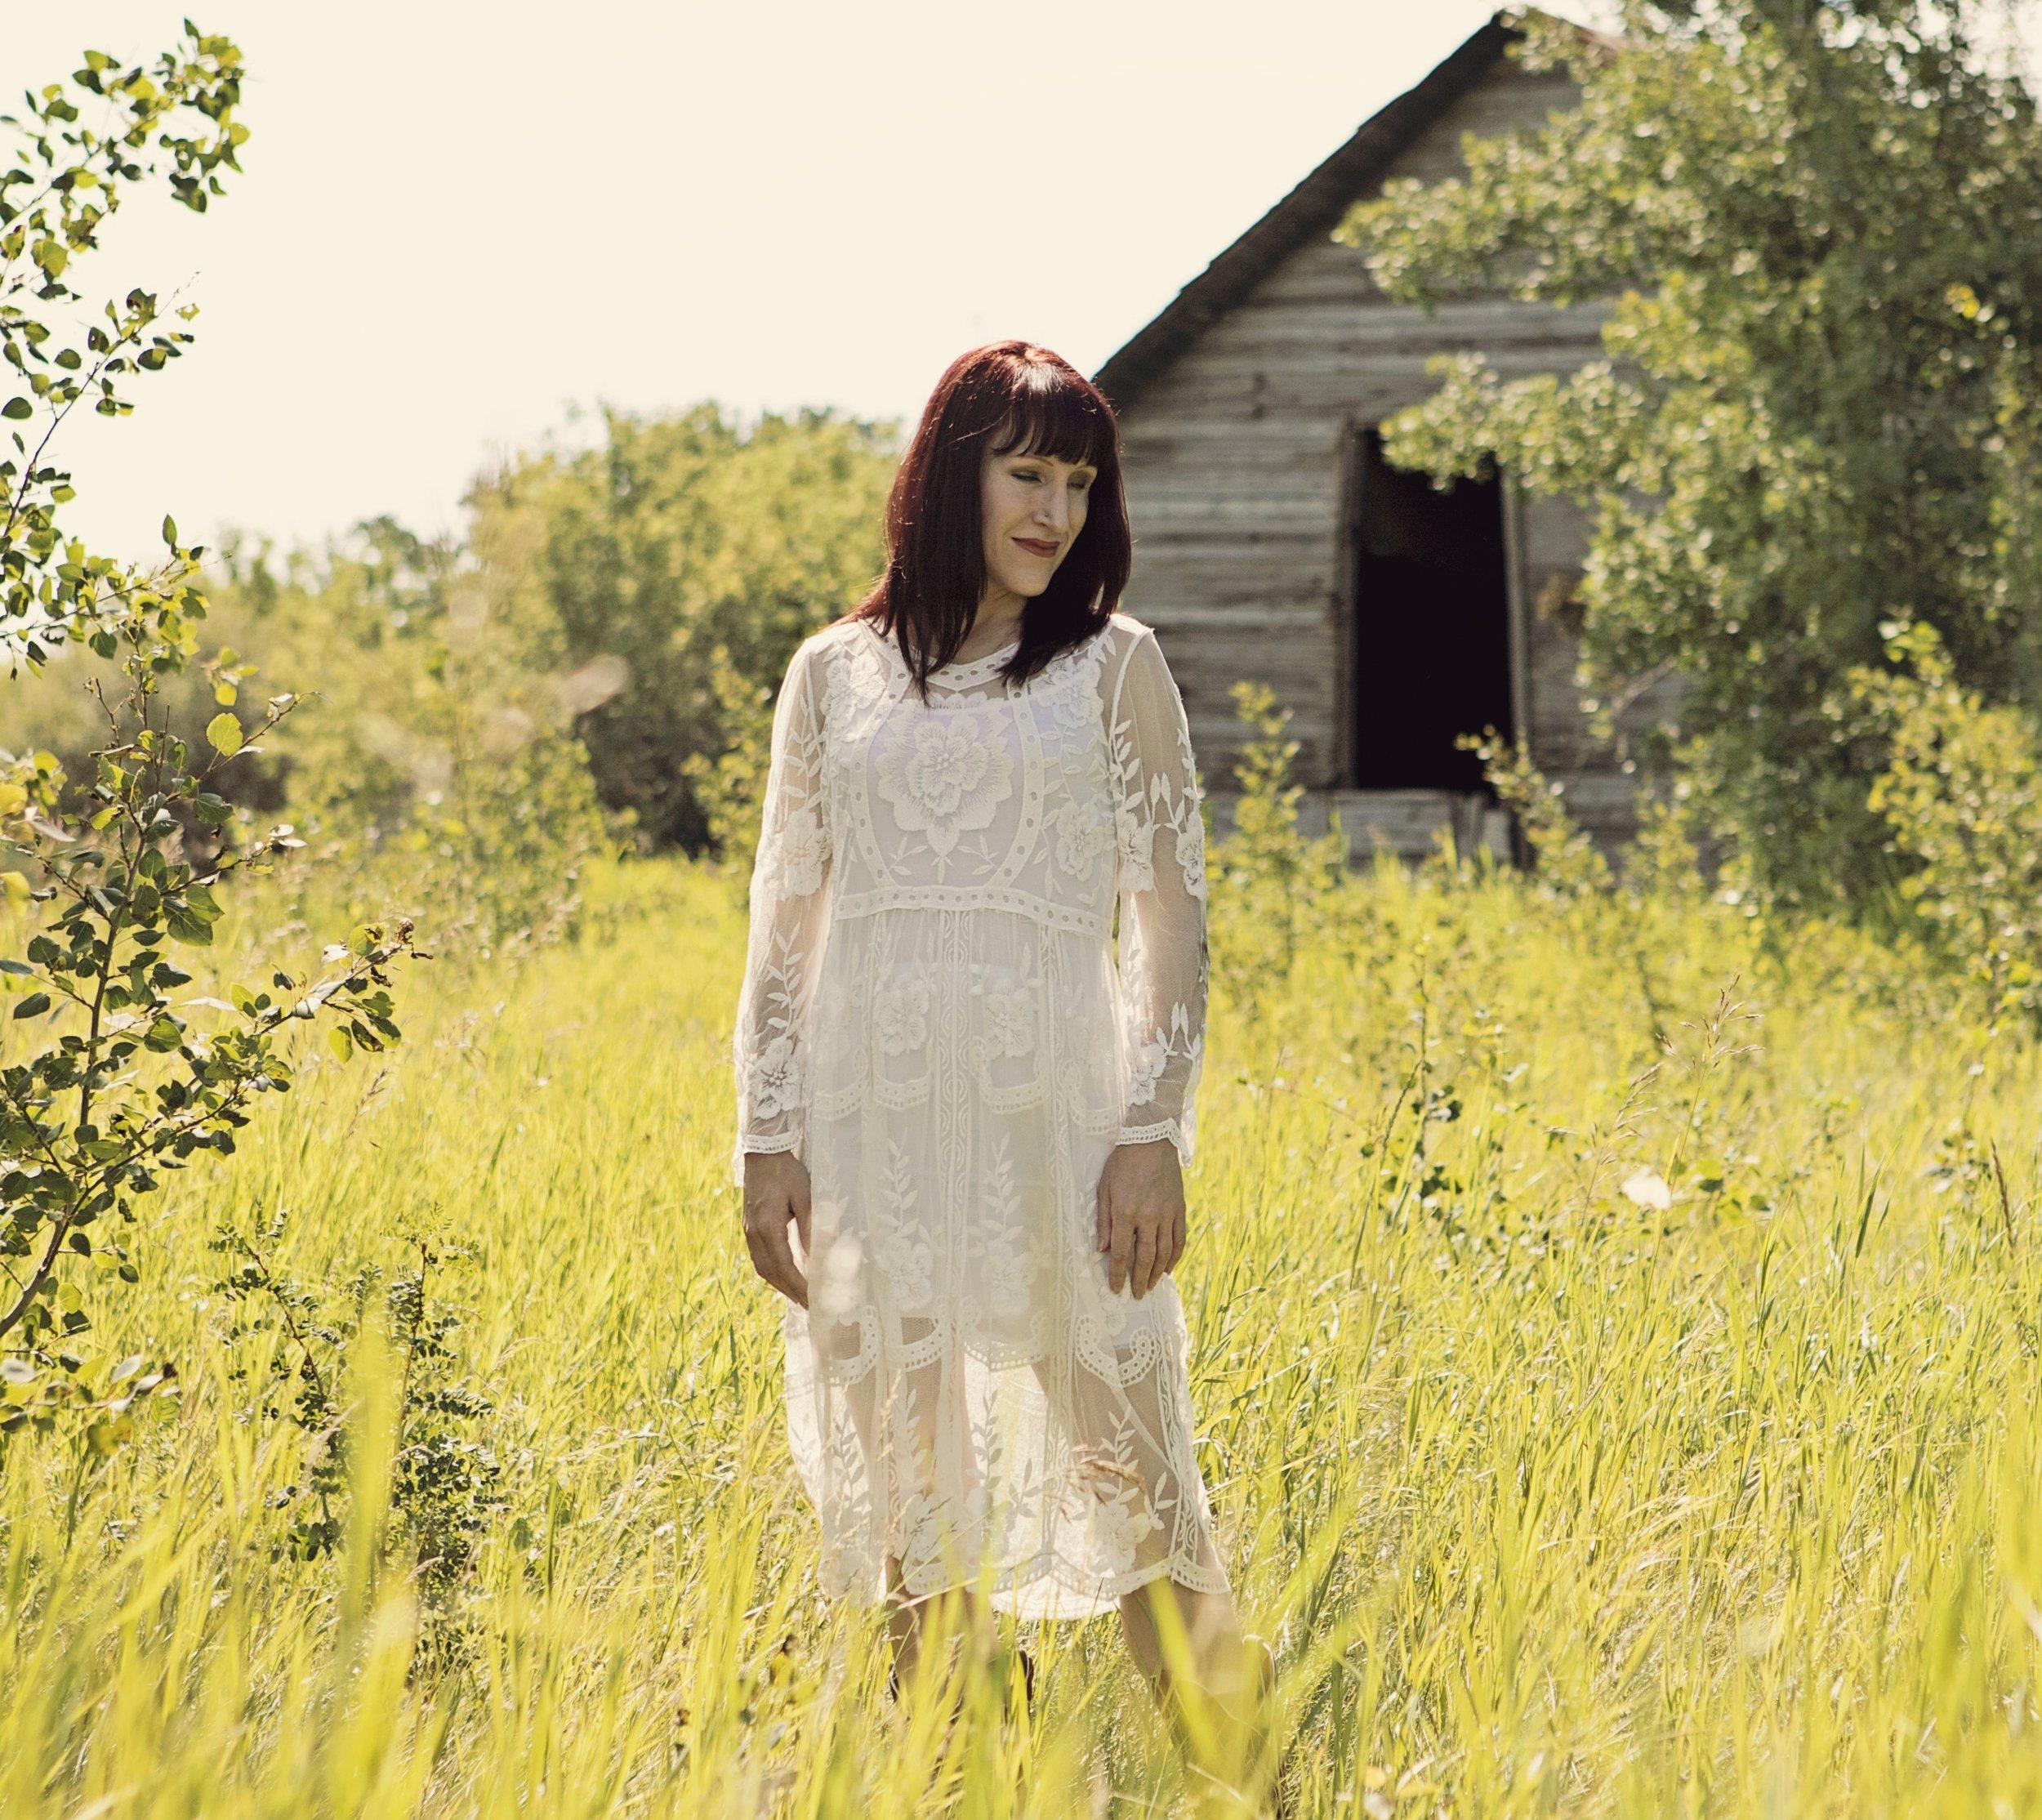 Farm girl 2.jpg